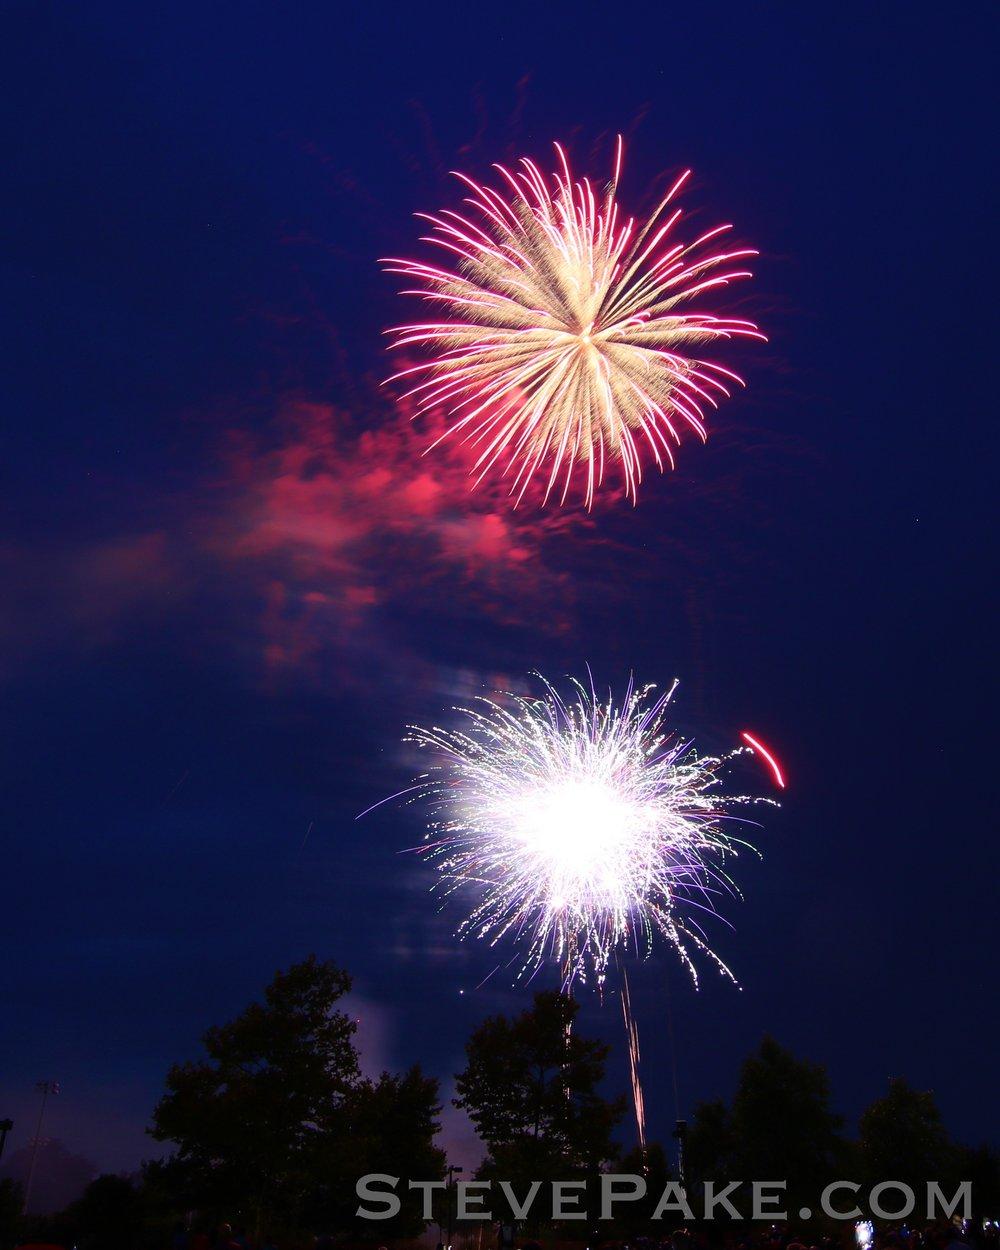 Fireworks2018_16_GE3A8521ap-HD-WM.jpg